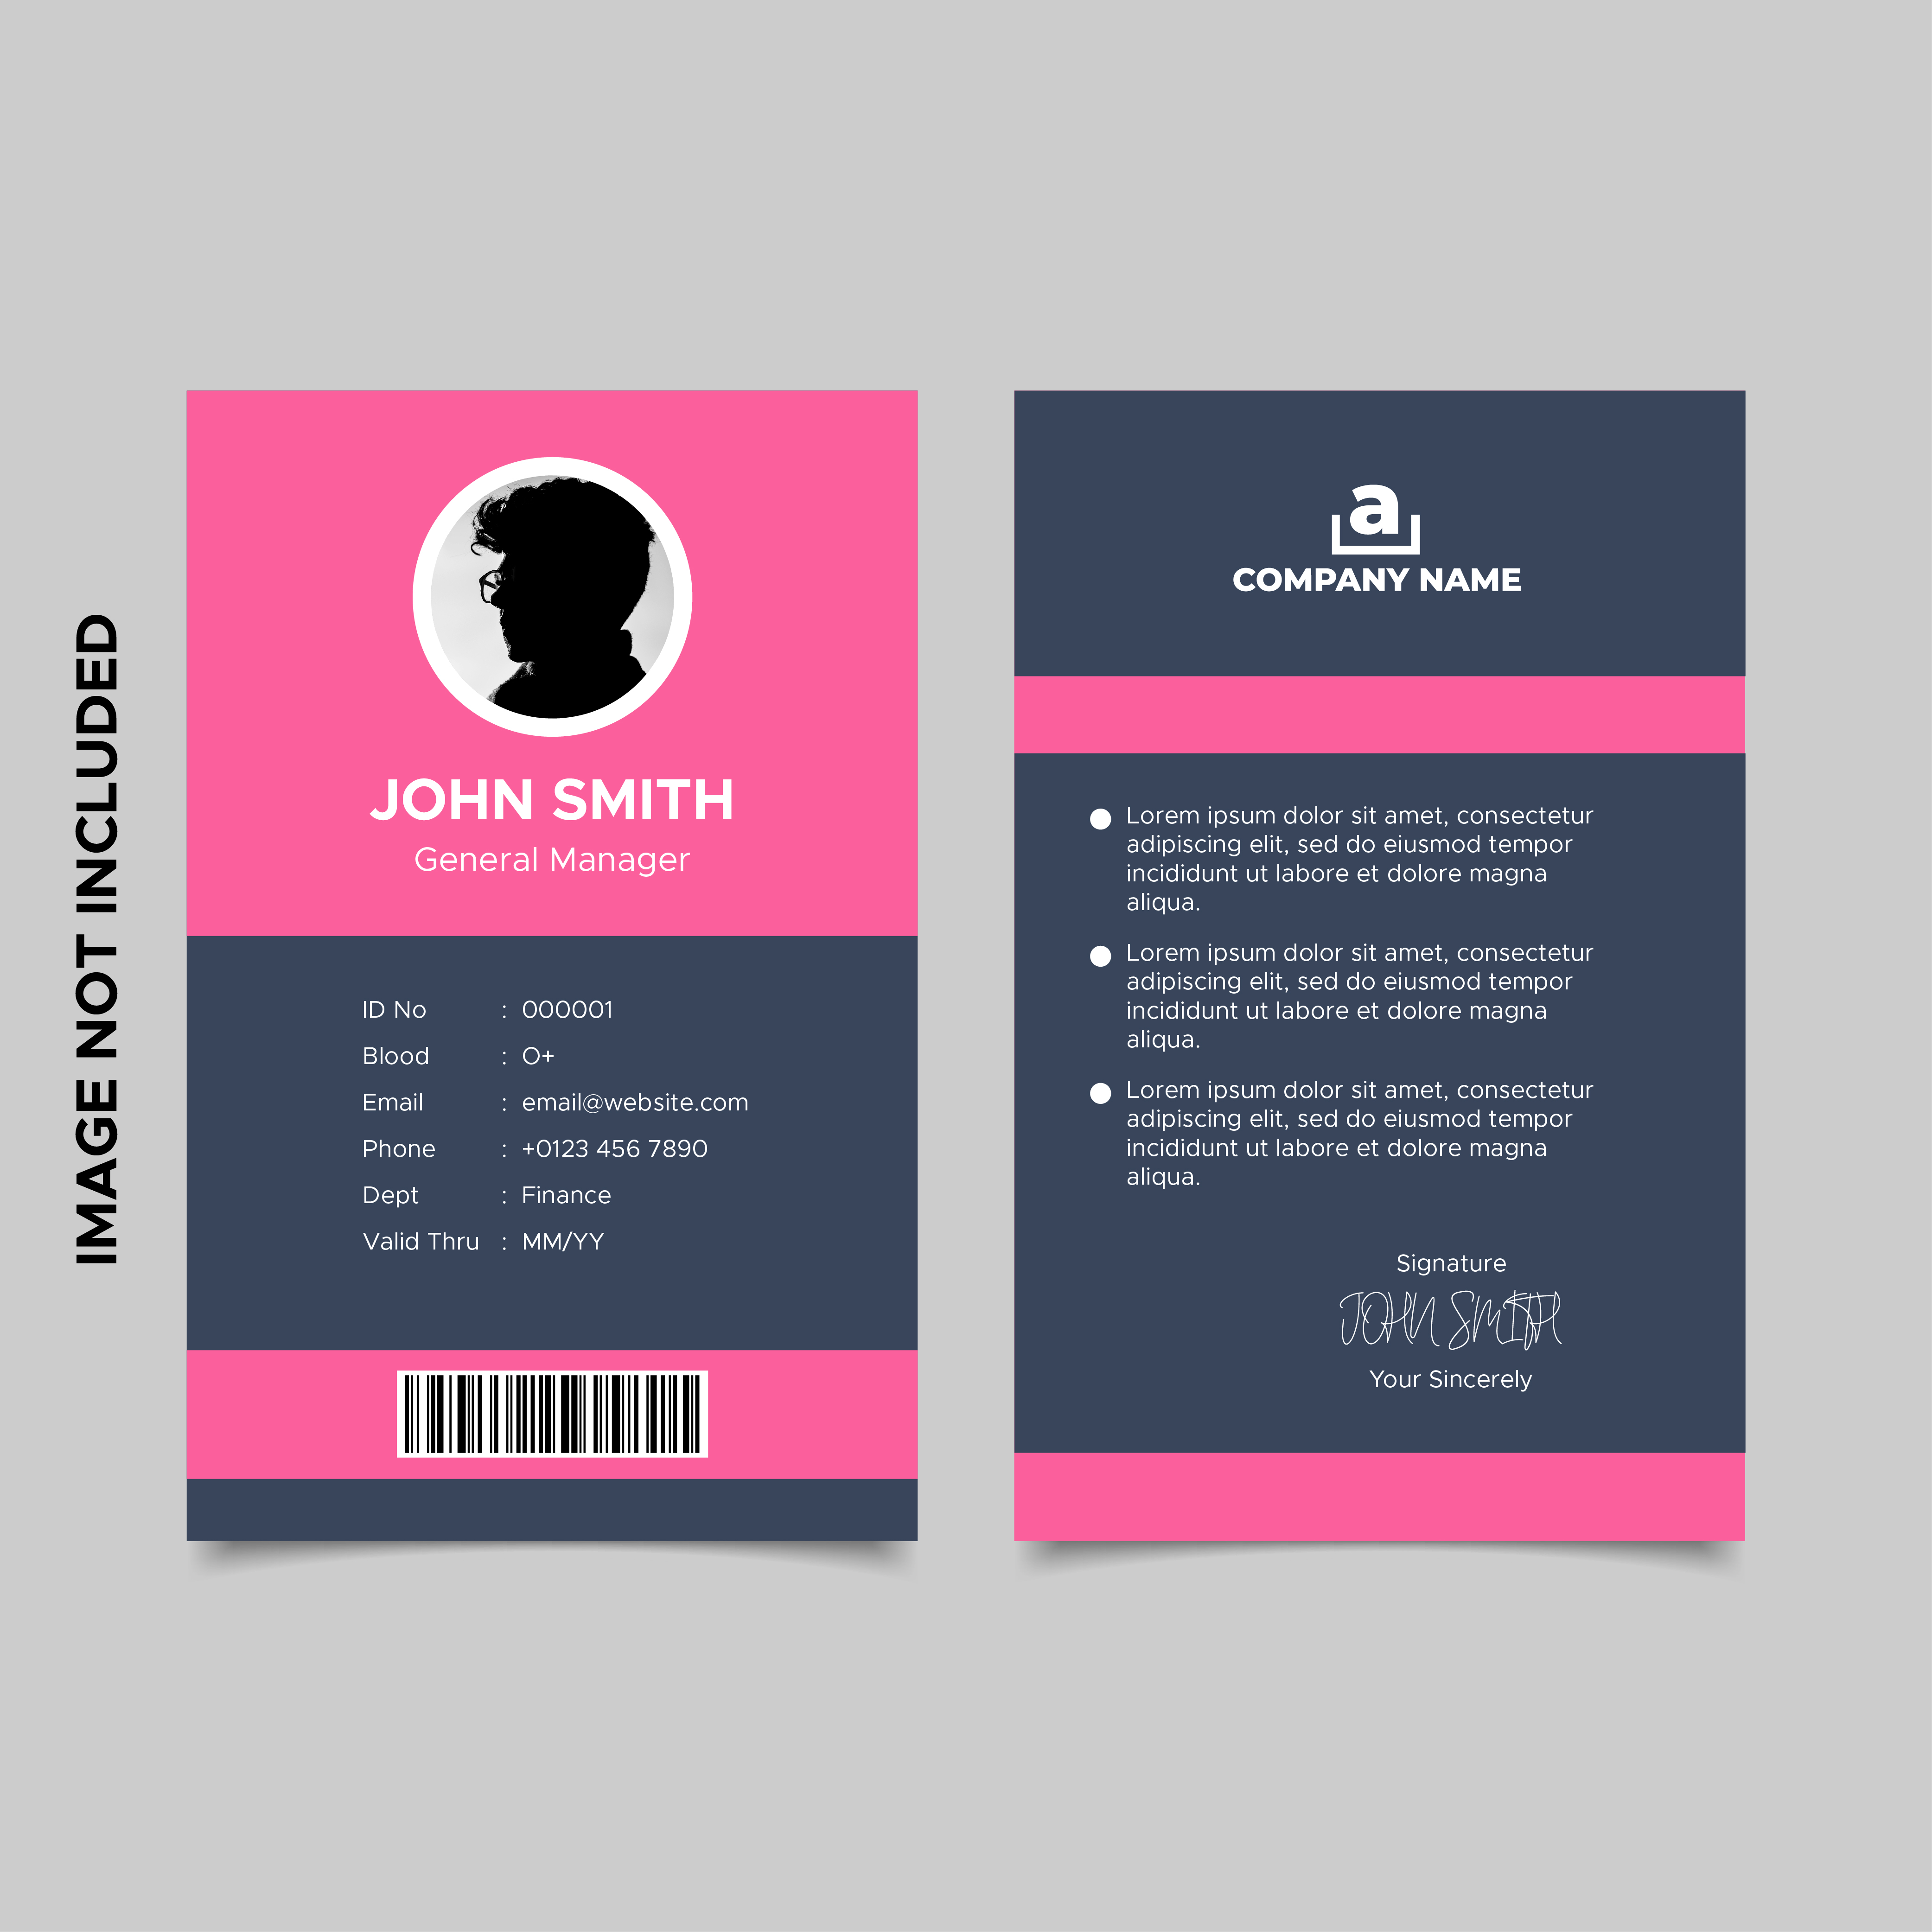 Modern Design Employee Id Card Template - Download Free ...